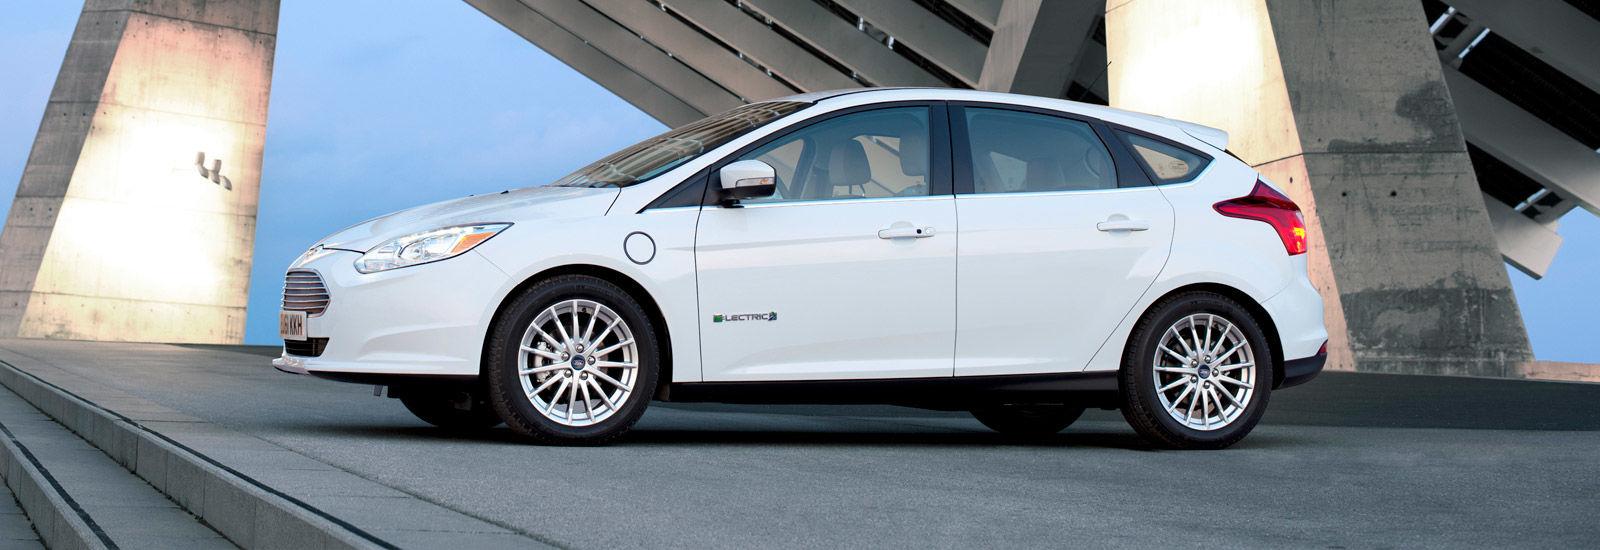 Grant To Buy Hybrid Car